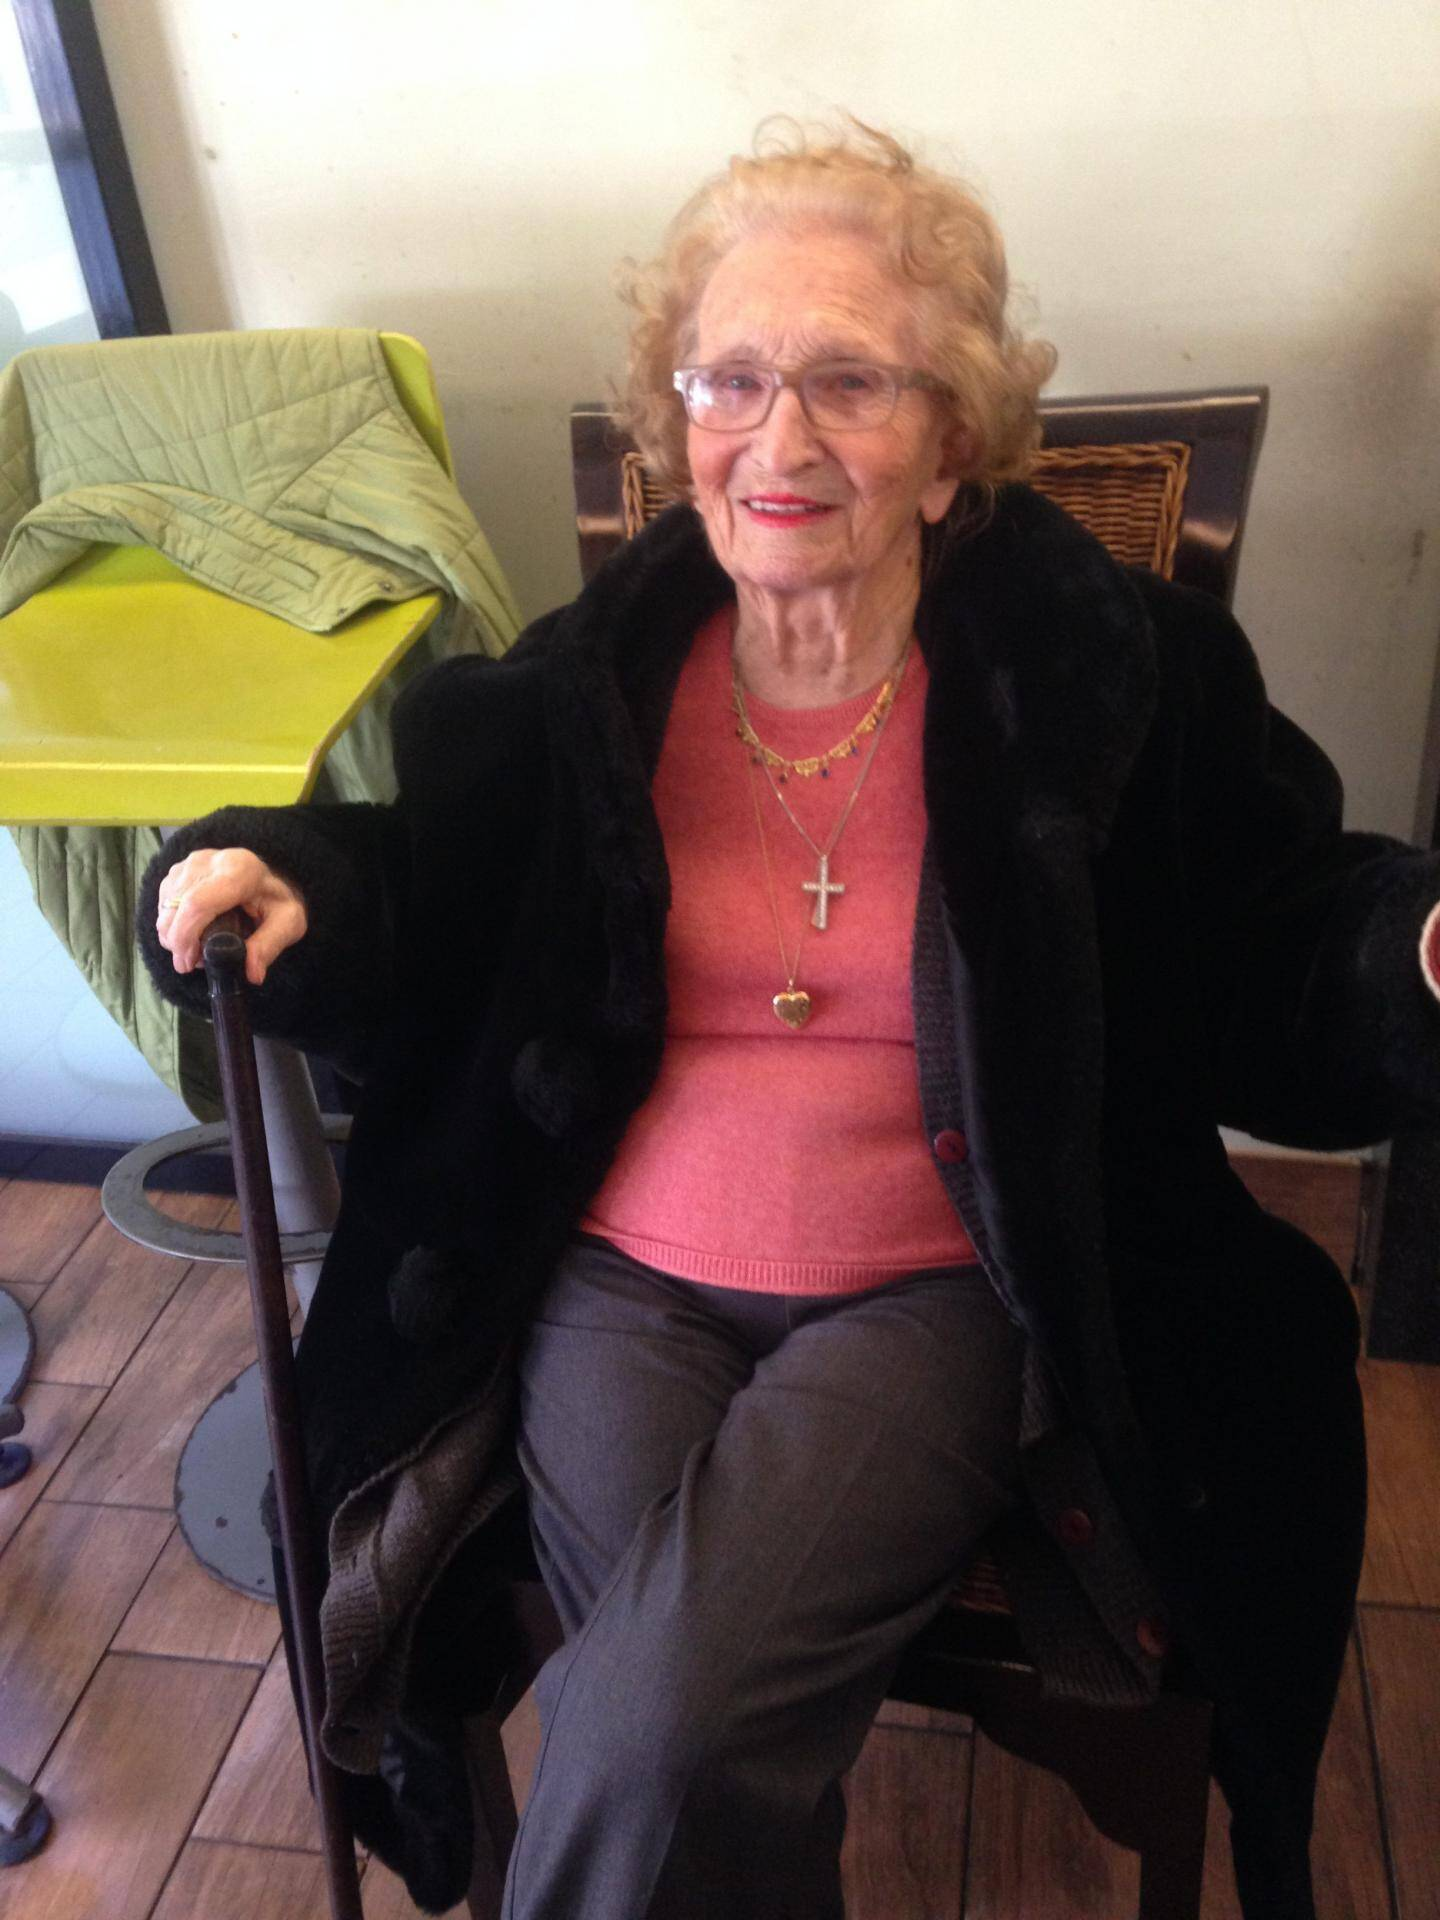 Odette Noyer venait d'avoir 94 ans.